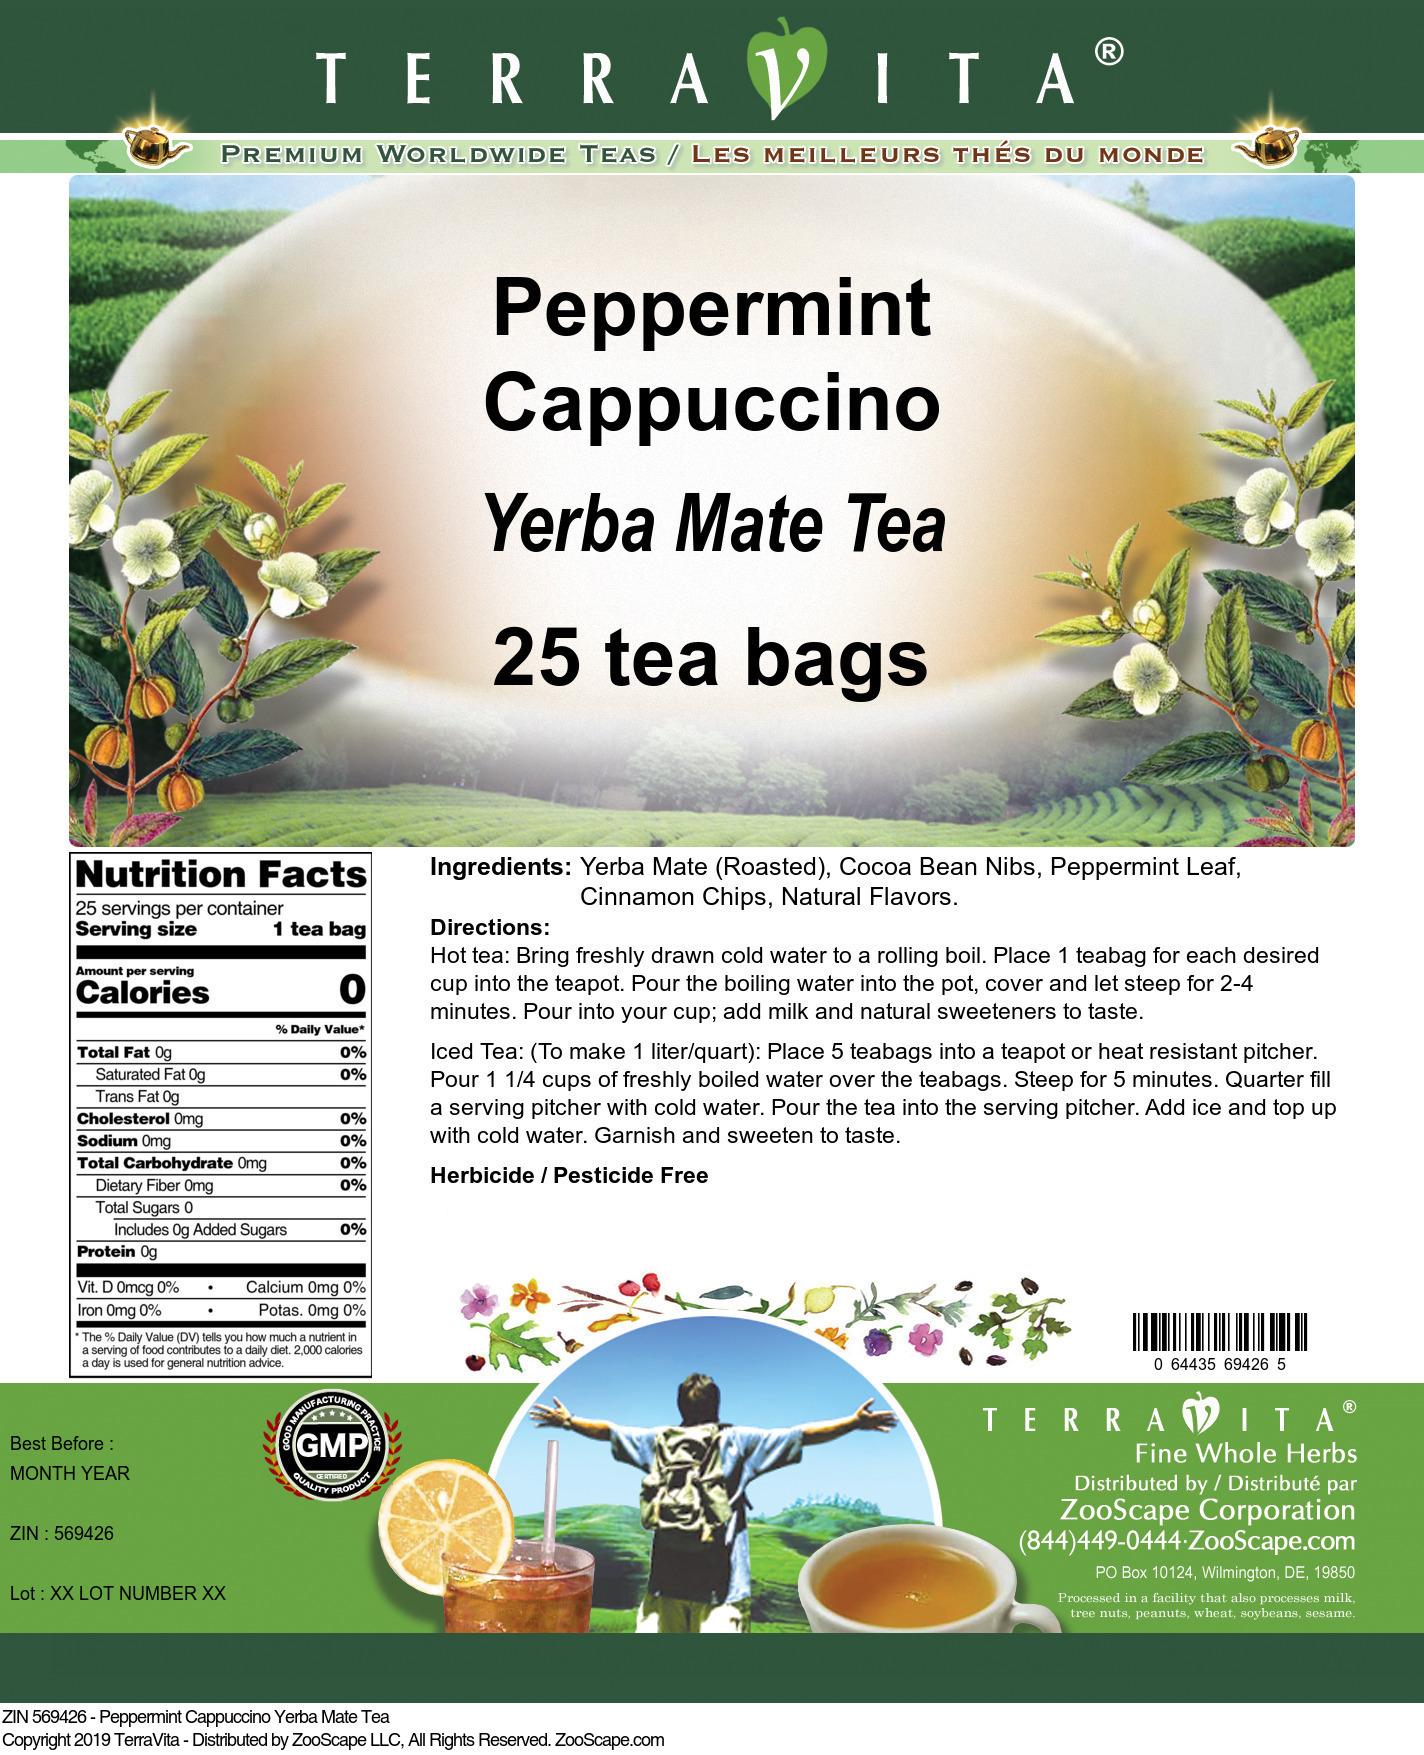 Peppermint Cappuccino Yerba Mate